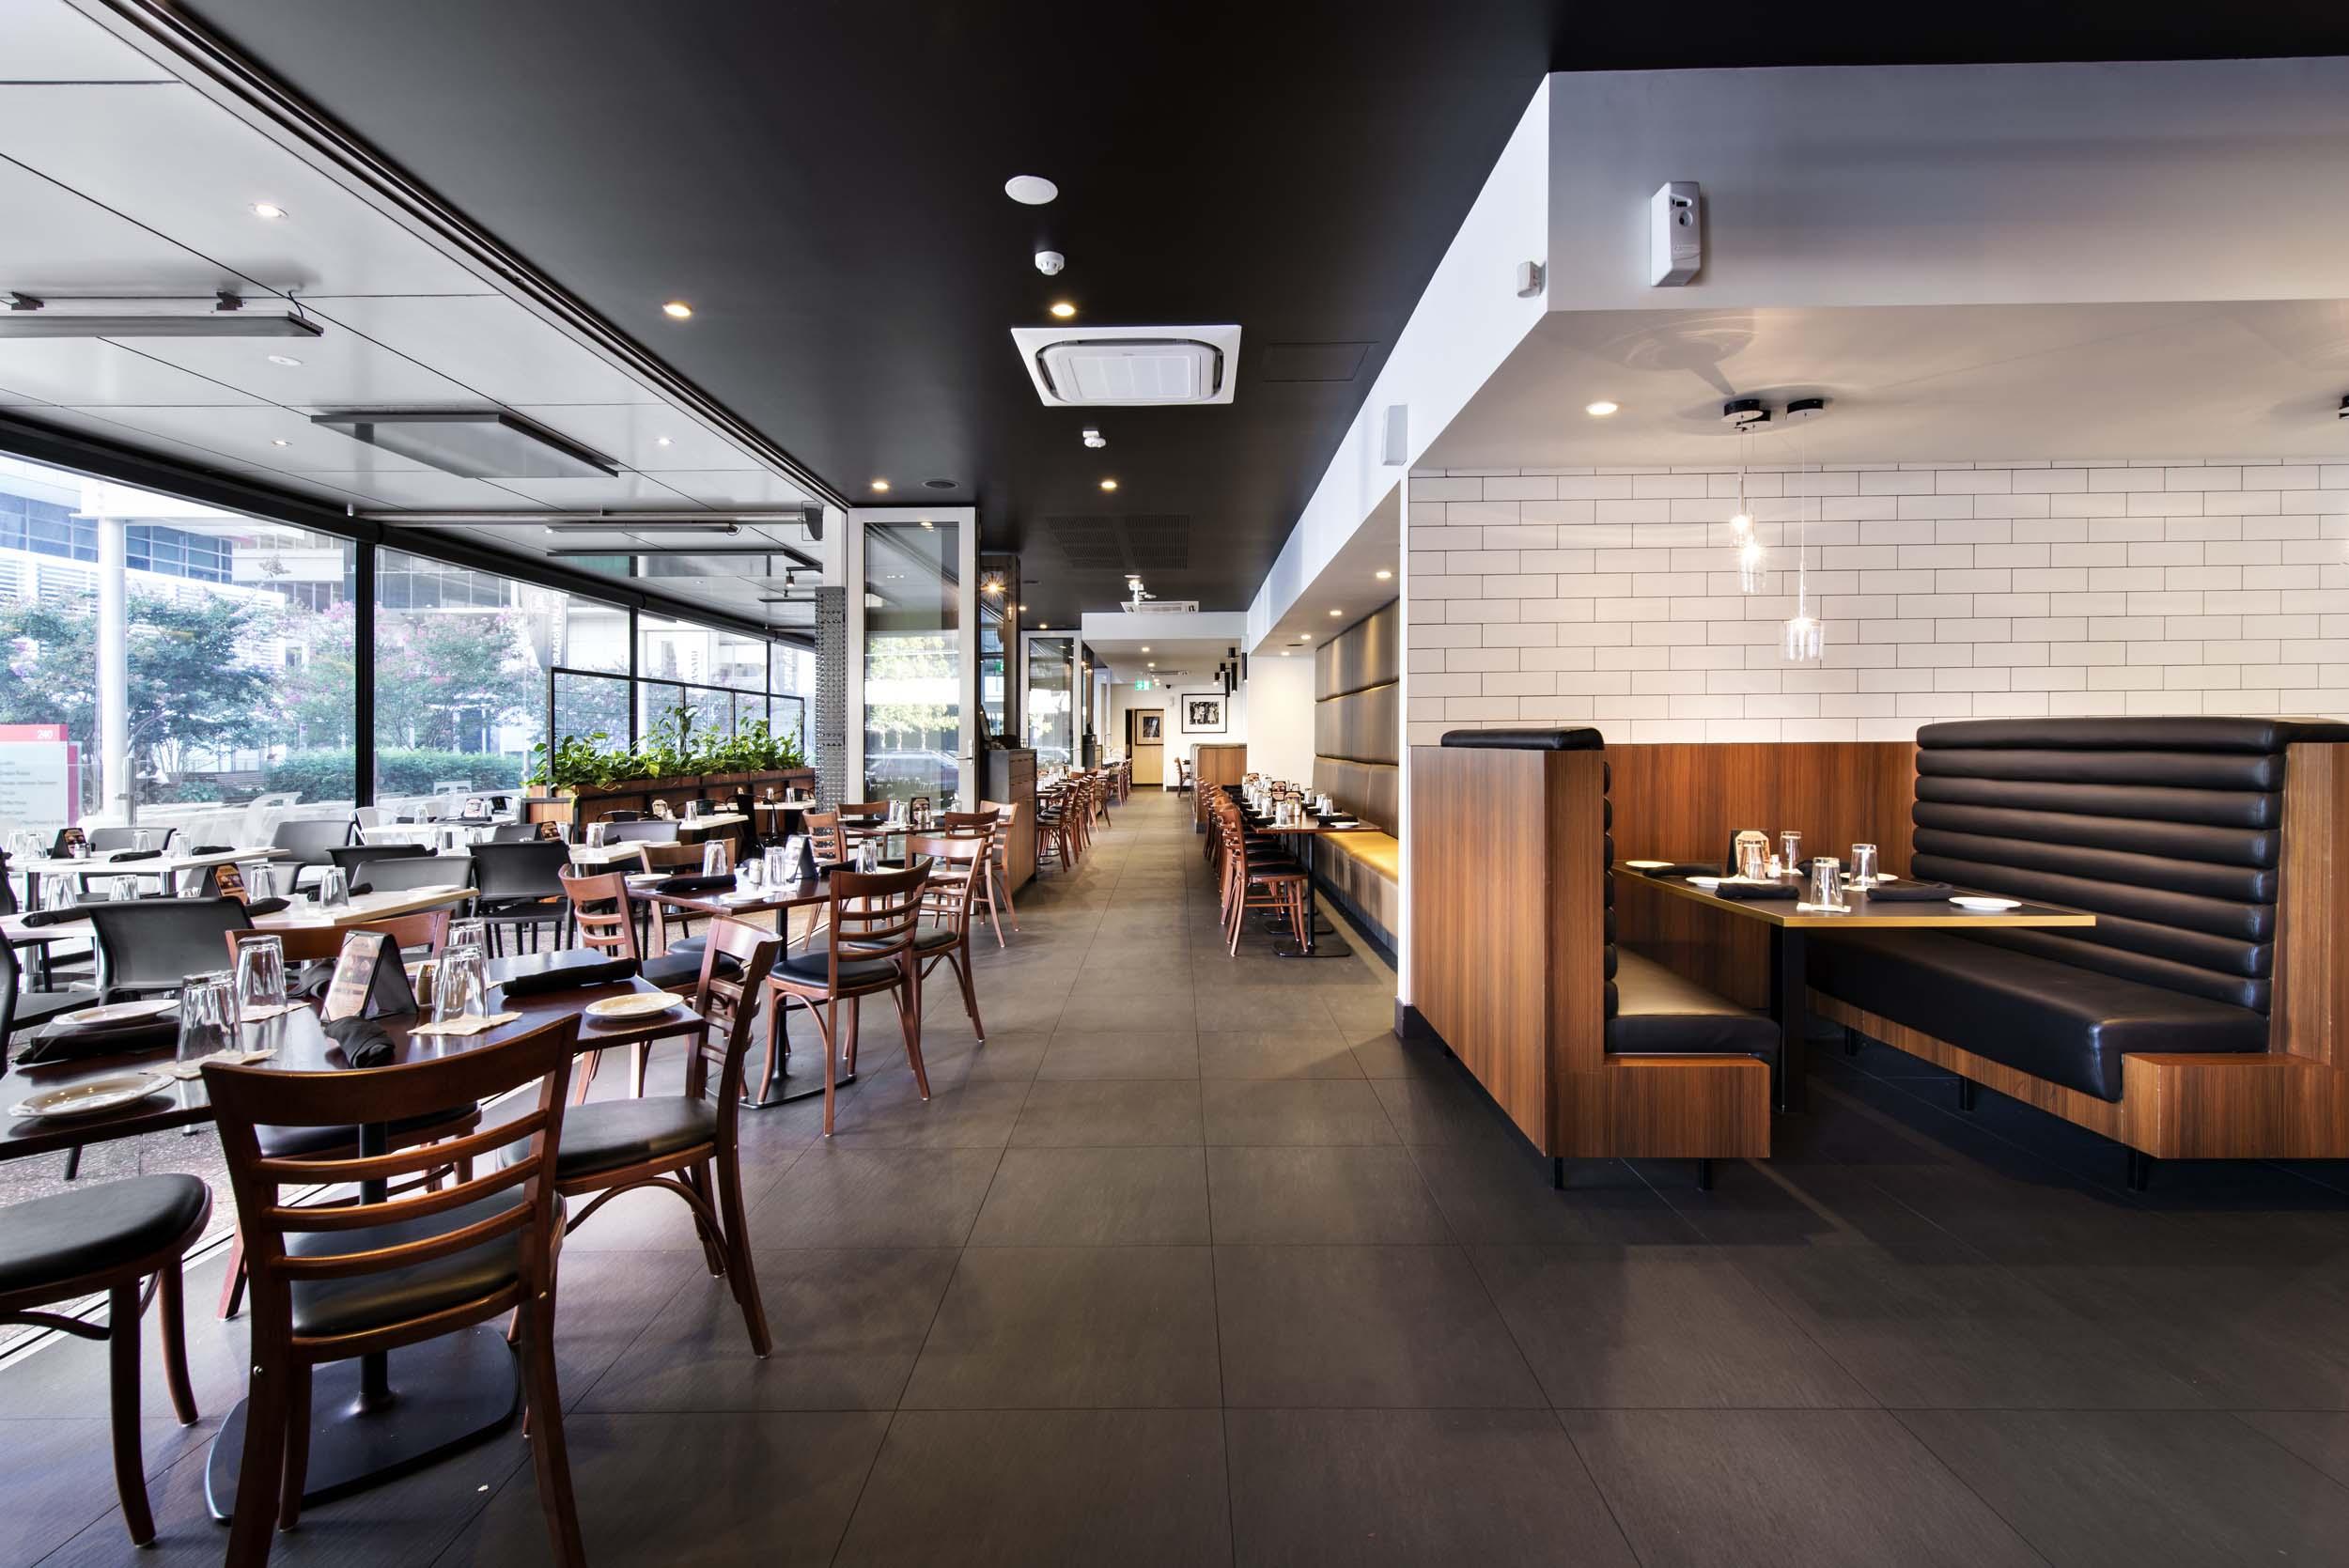 commercial-interior-tony-romas-perth-restaurant-western-australia-architecture-design-architect.jpg